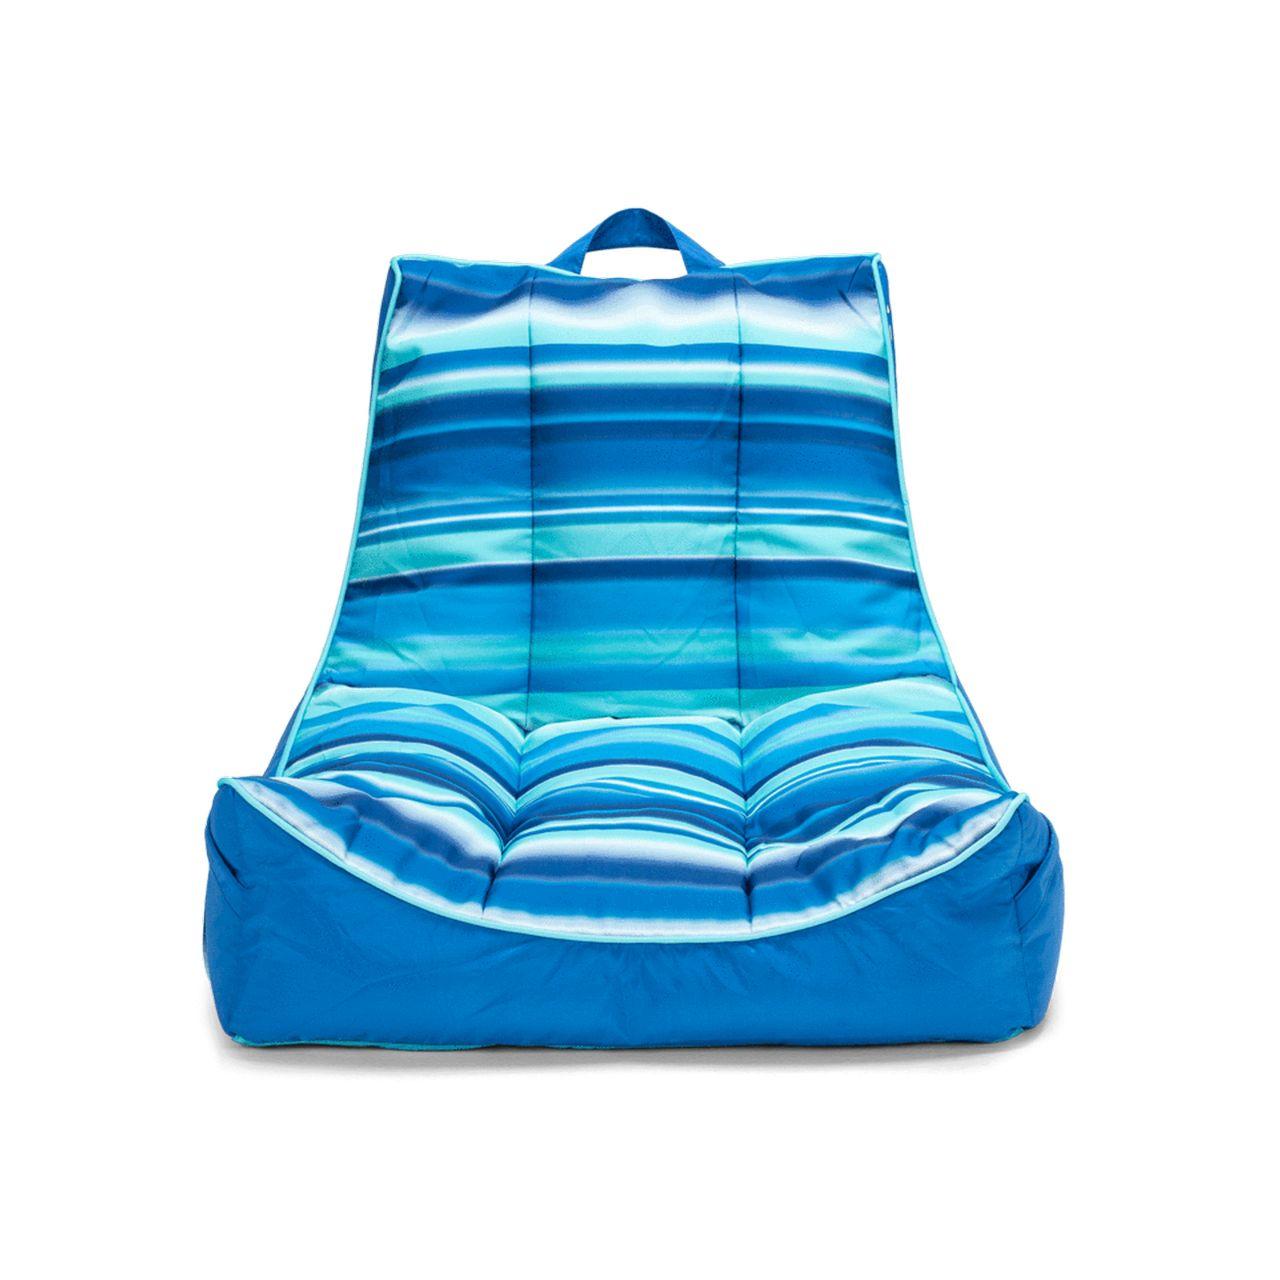 Big Joe Captain's Pool Float - Blurred Blue